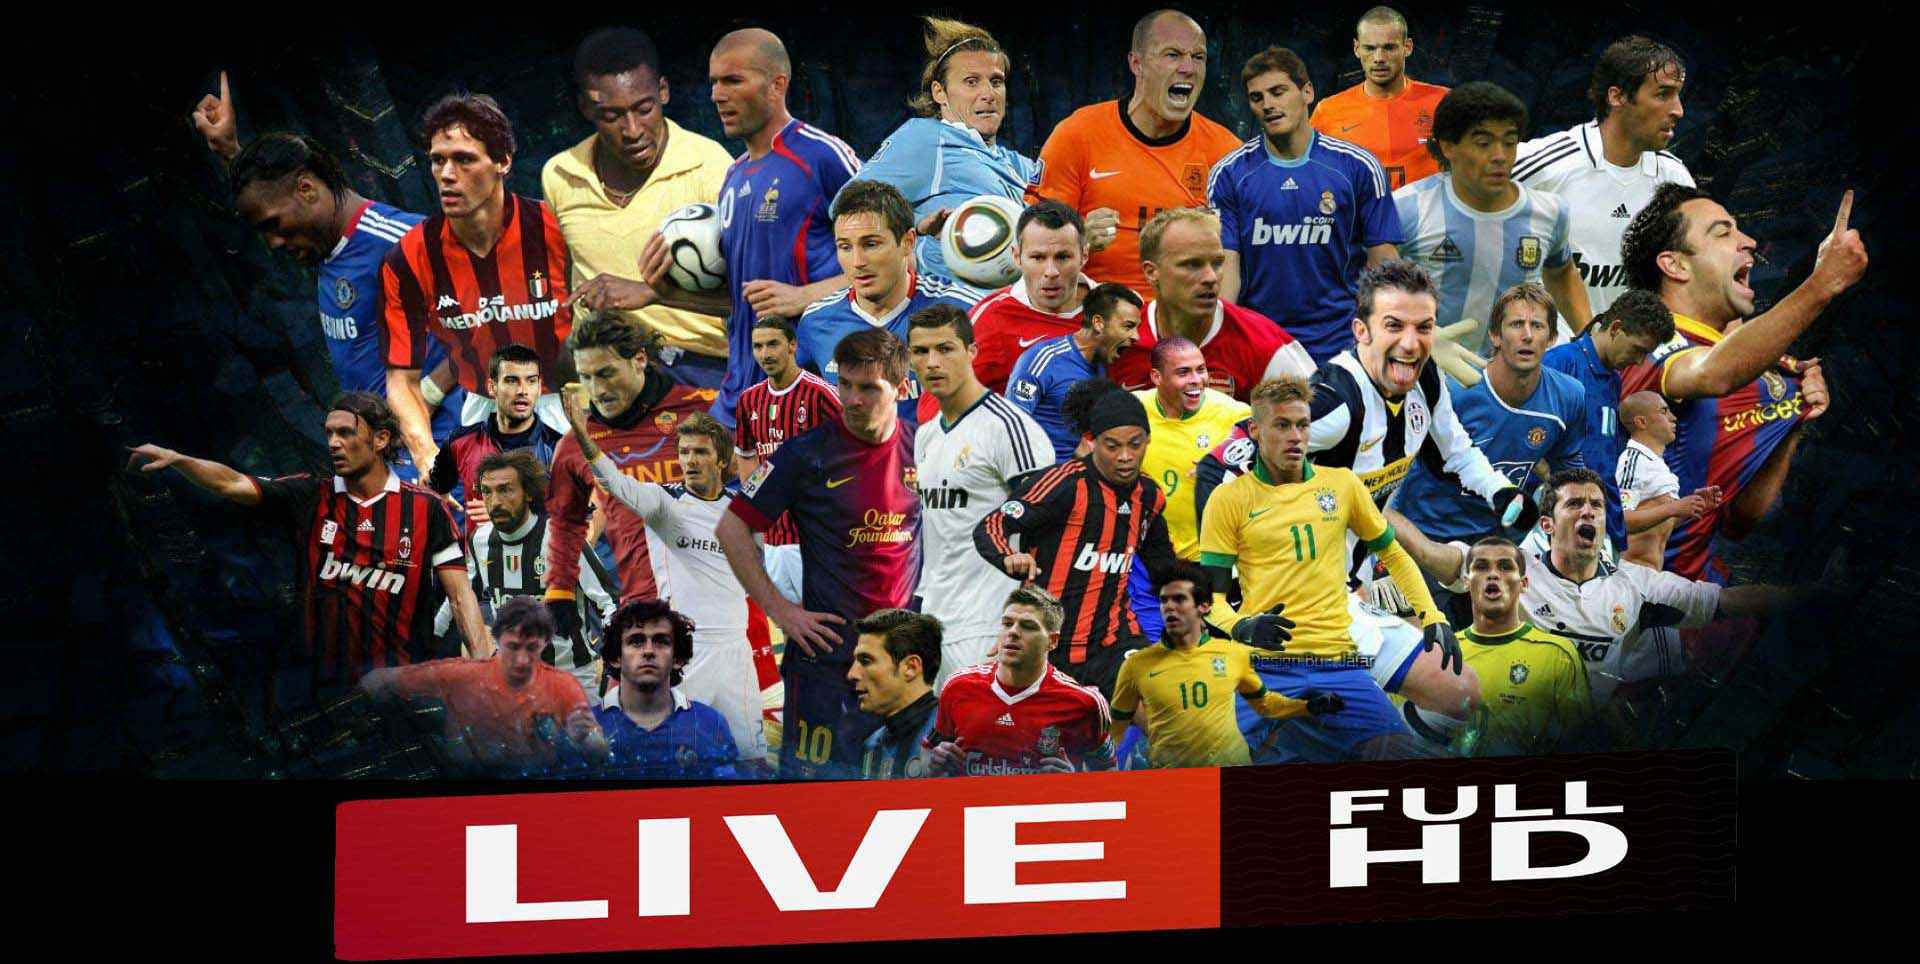 Juventus Vs Real Madrid live